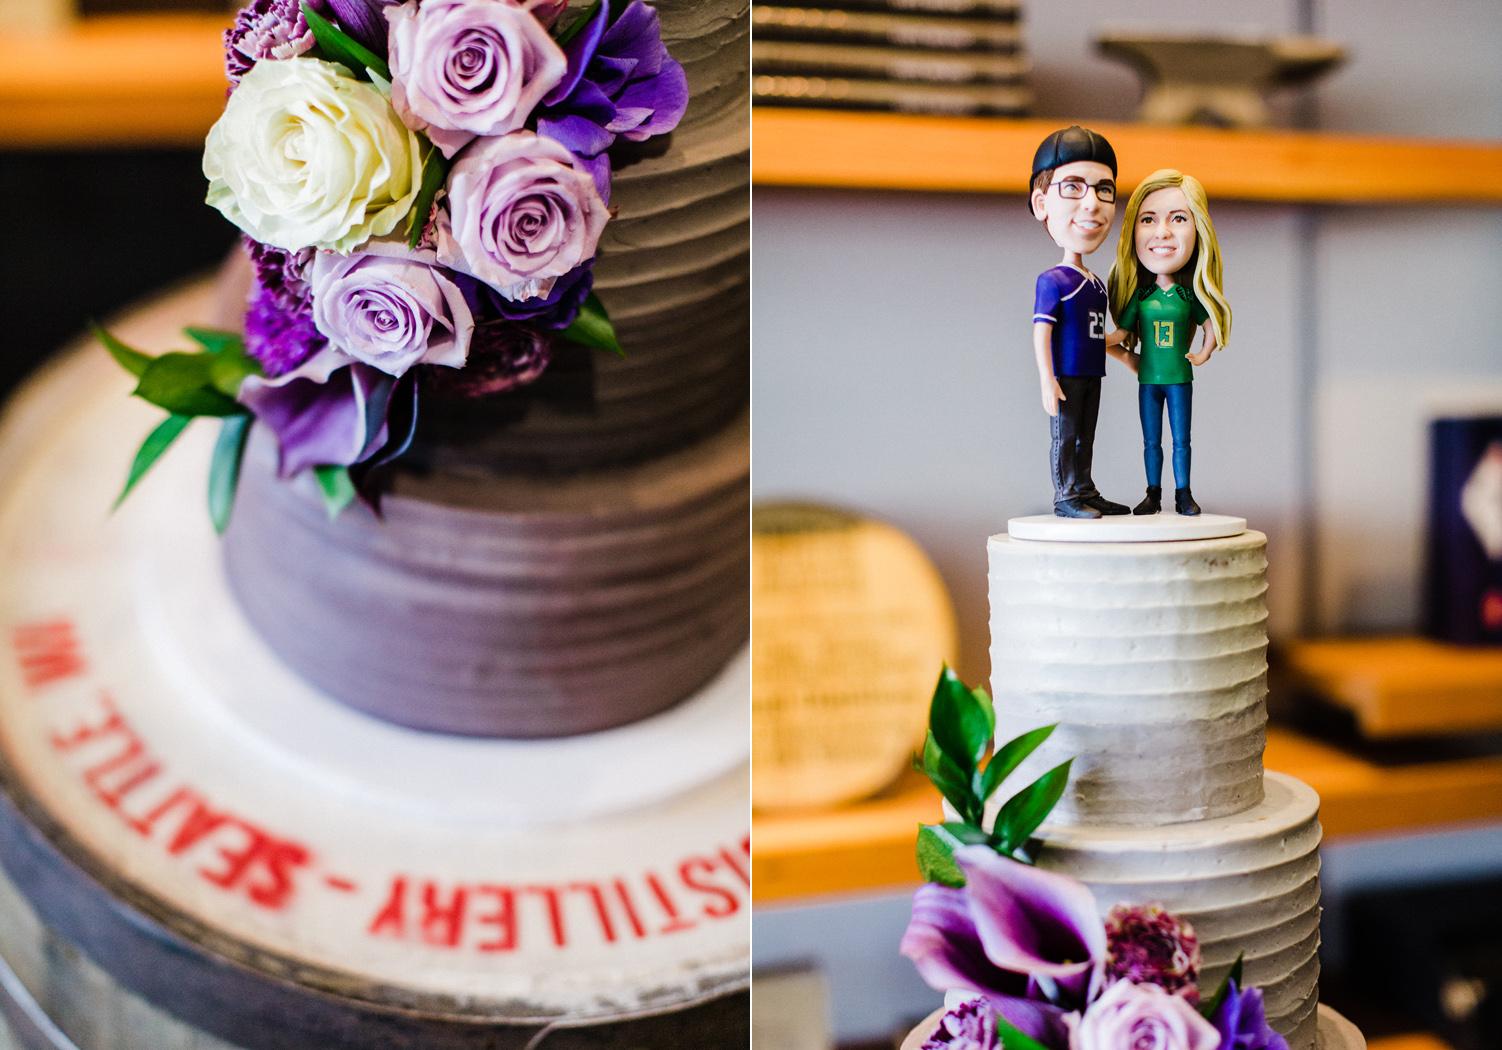 Westland Distillery Indoor Wedding Venue with Purple Ombre Cake by Honey Crumb Cake Studio